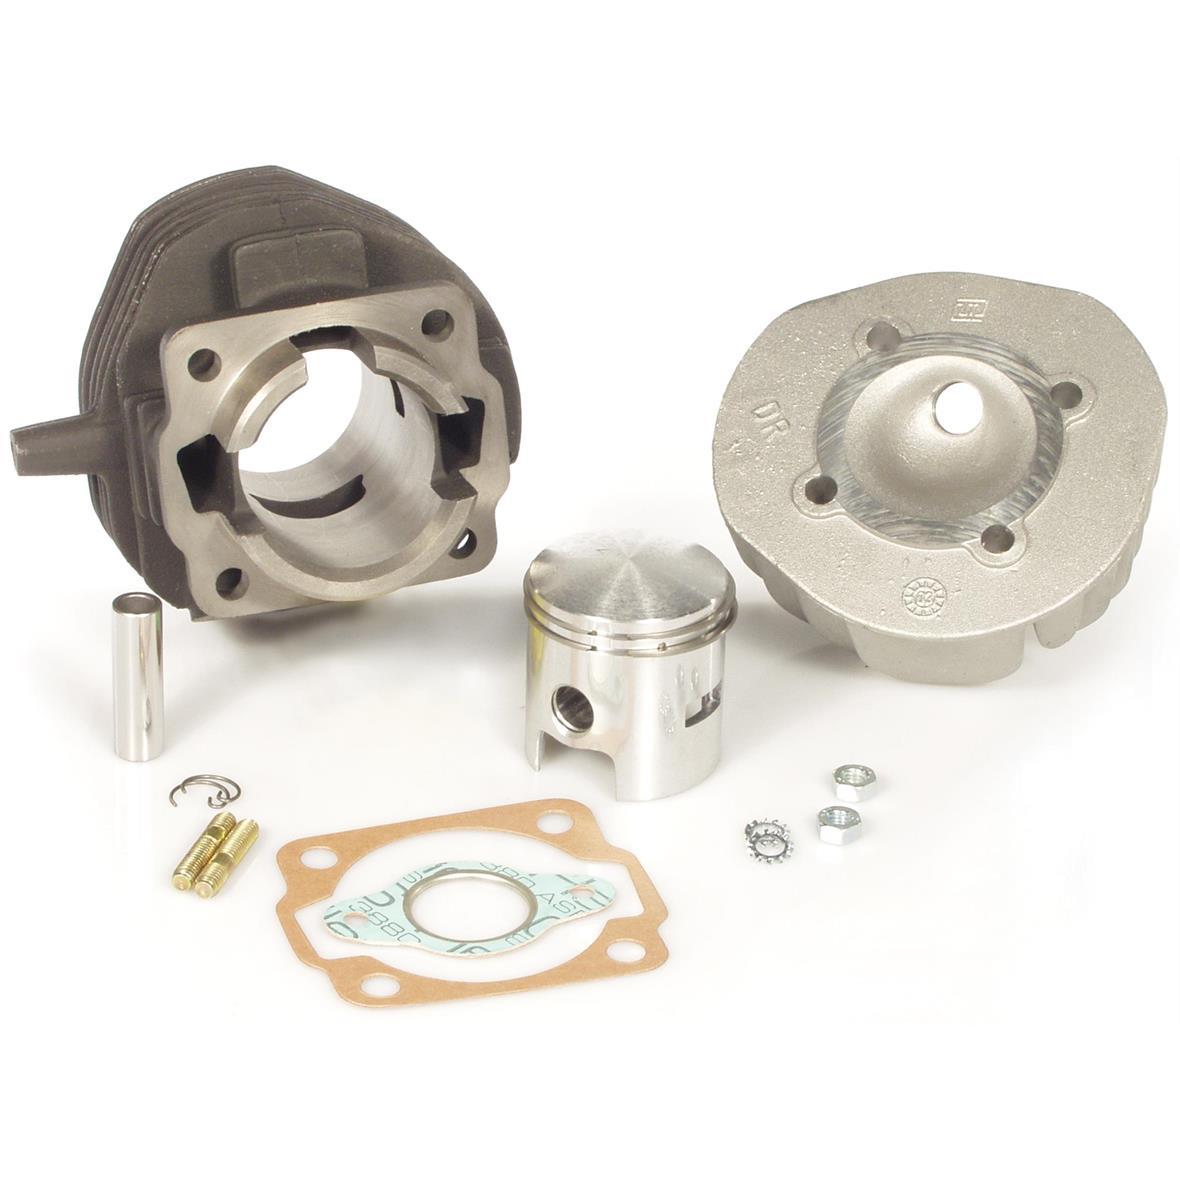 Productafbeelding voor 'Racing Cilinder D.R. by SIP 75 ccTitle'